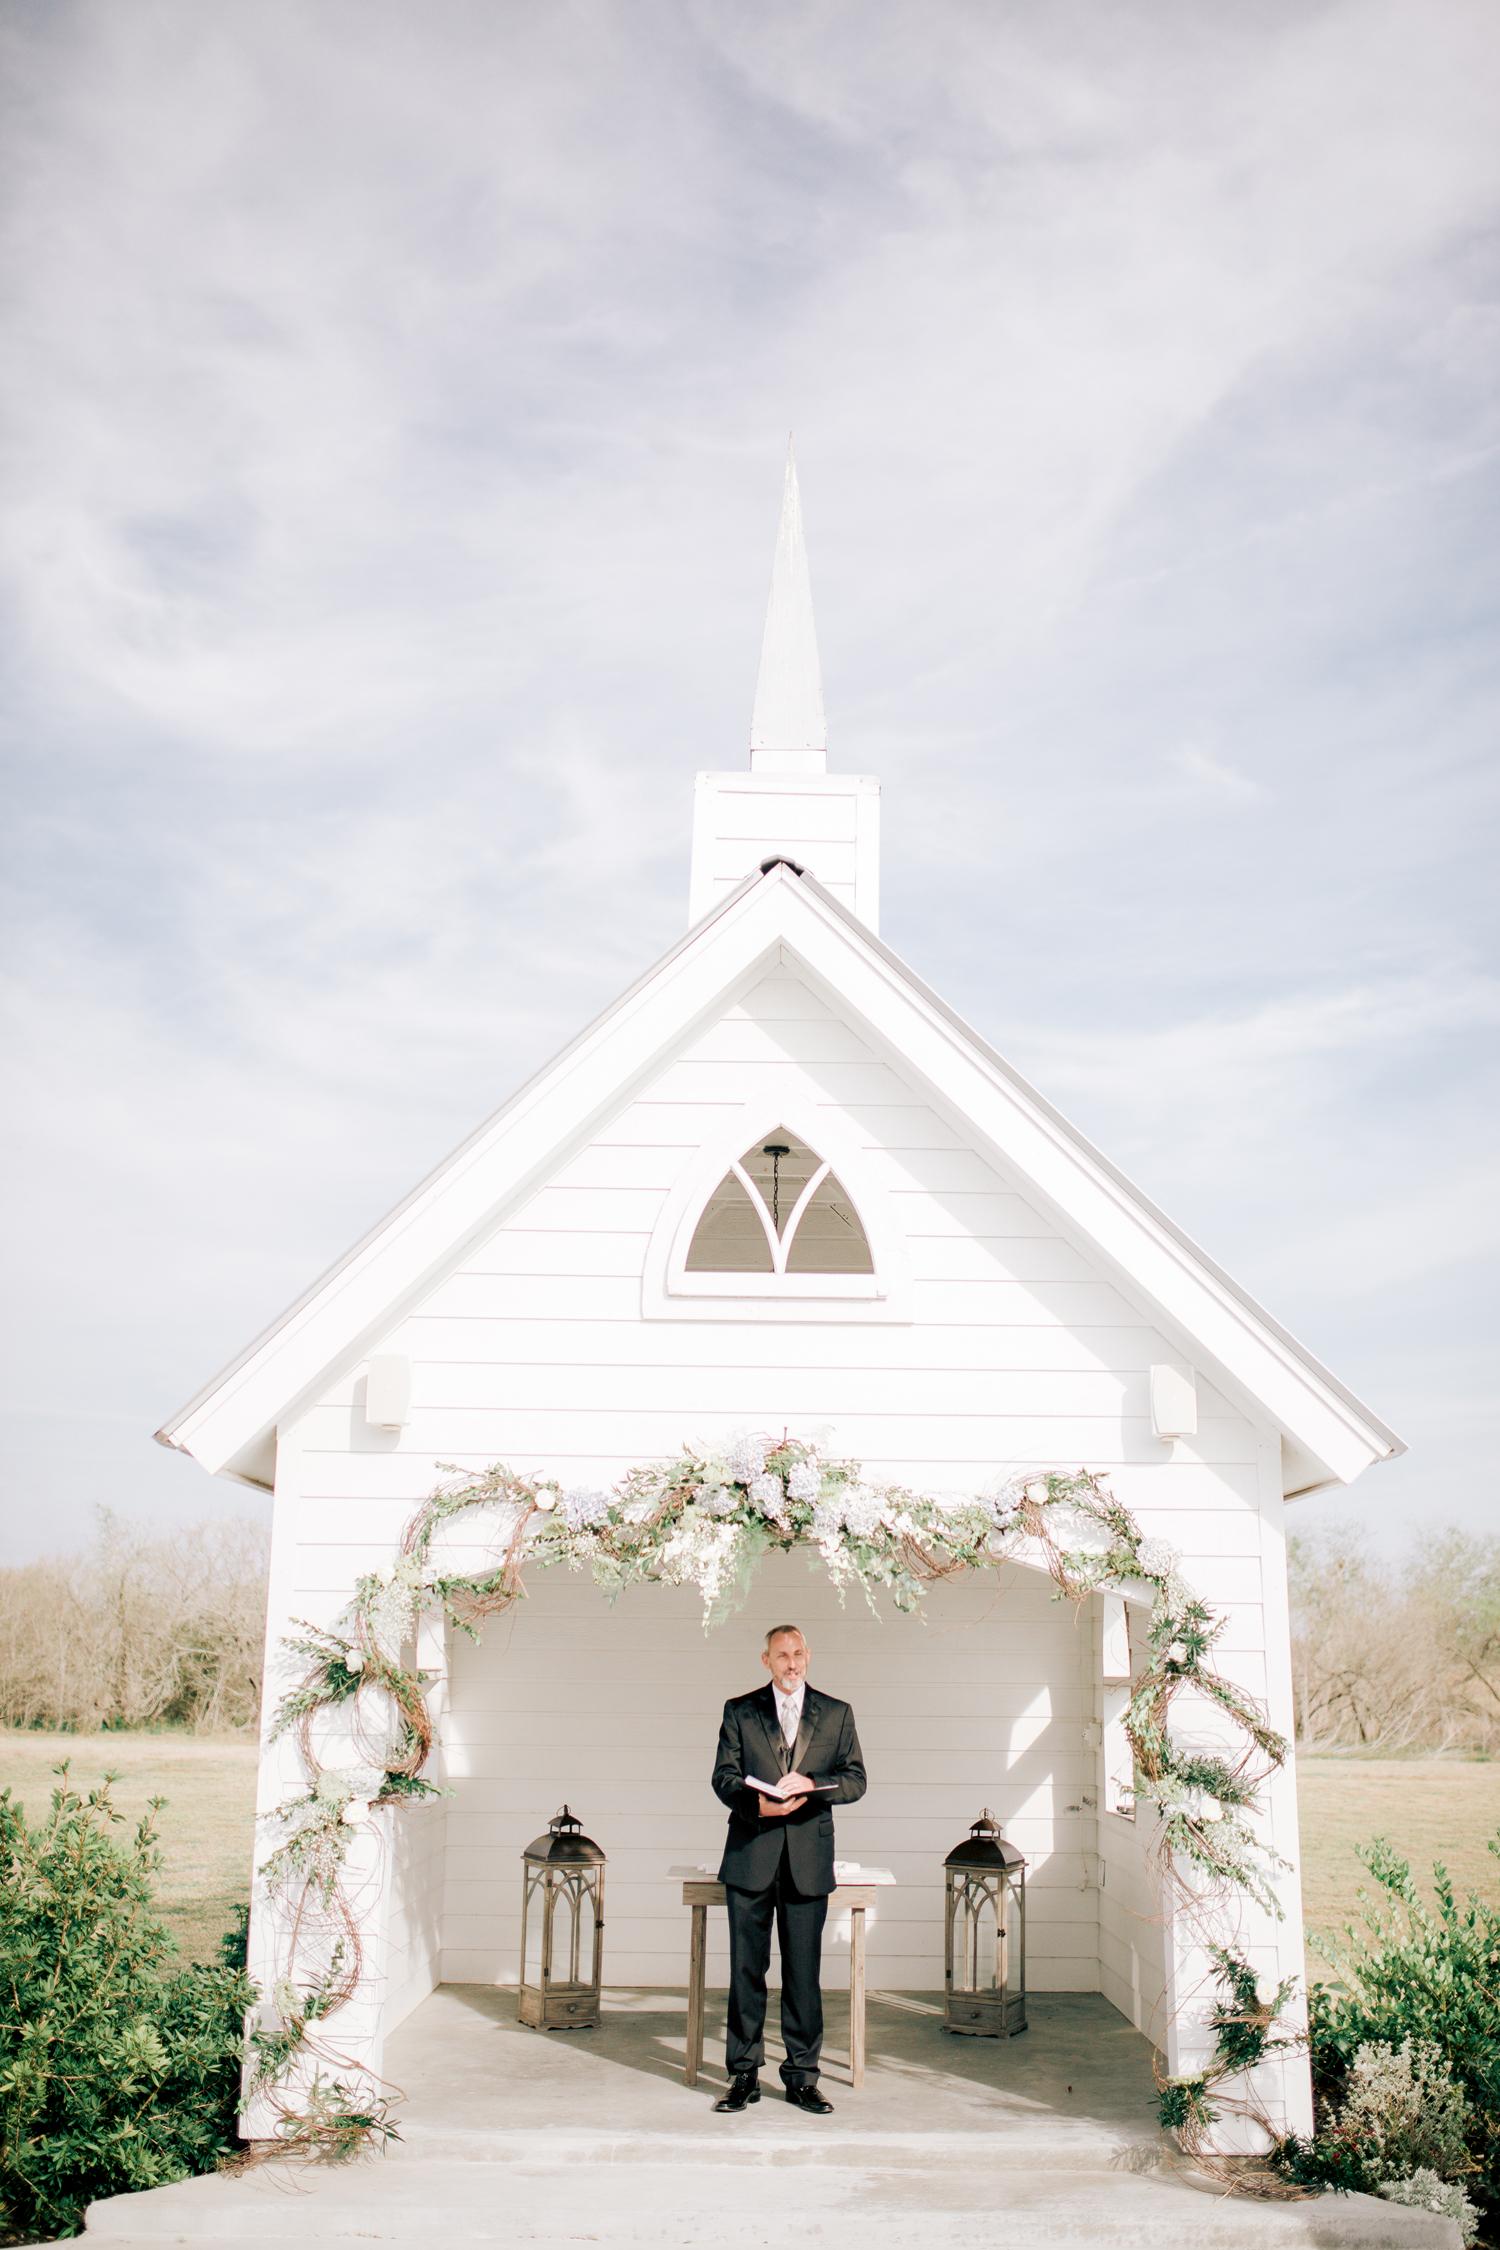 alaa-marzouk-photography-rgvweddingphotographer-rio-grande-valley-mathis-wedding-bridal-bride-san-antonio-portrait-weddings-mcallen-89.jpg